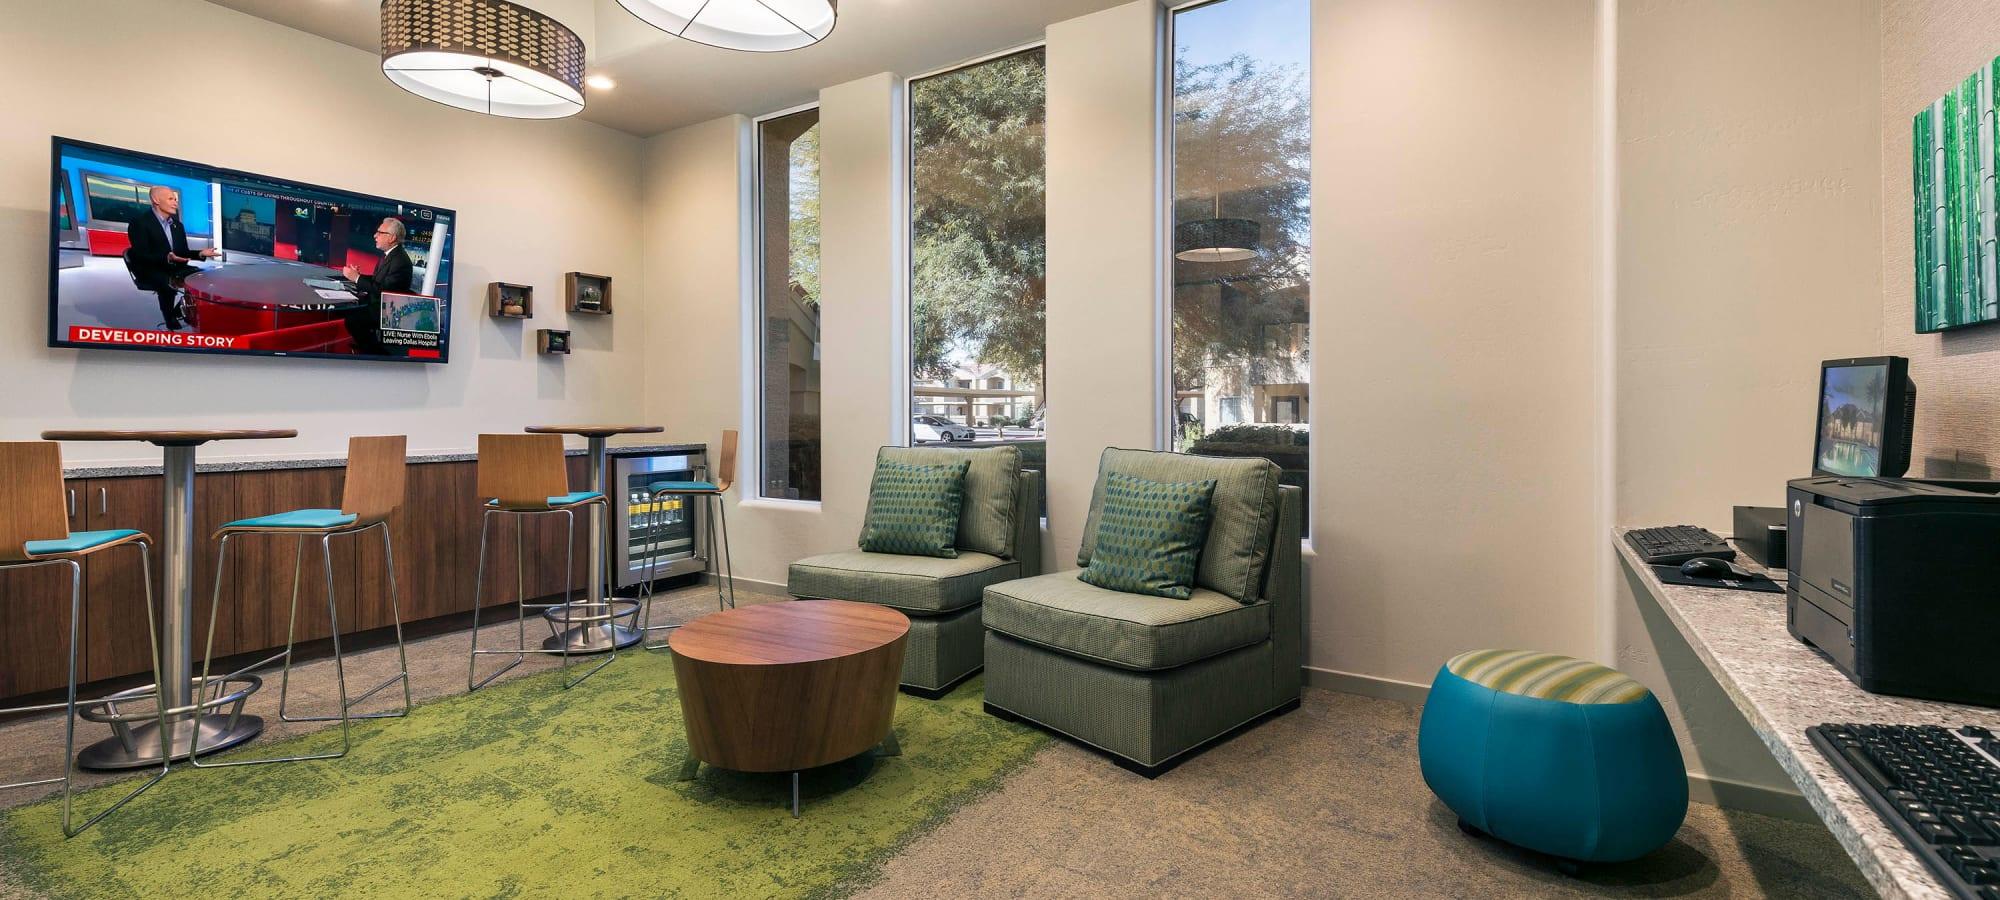 Business center at Mira Santi in Chandler, Arizona